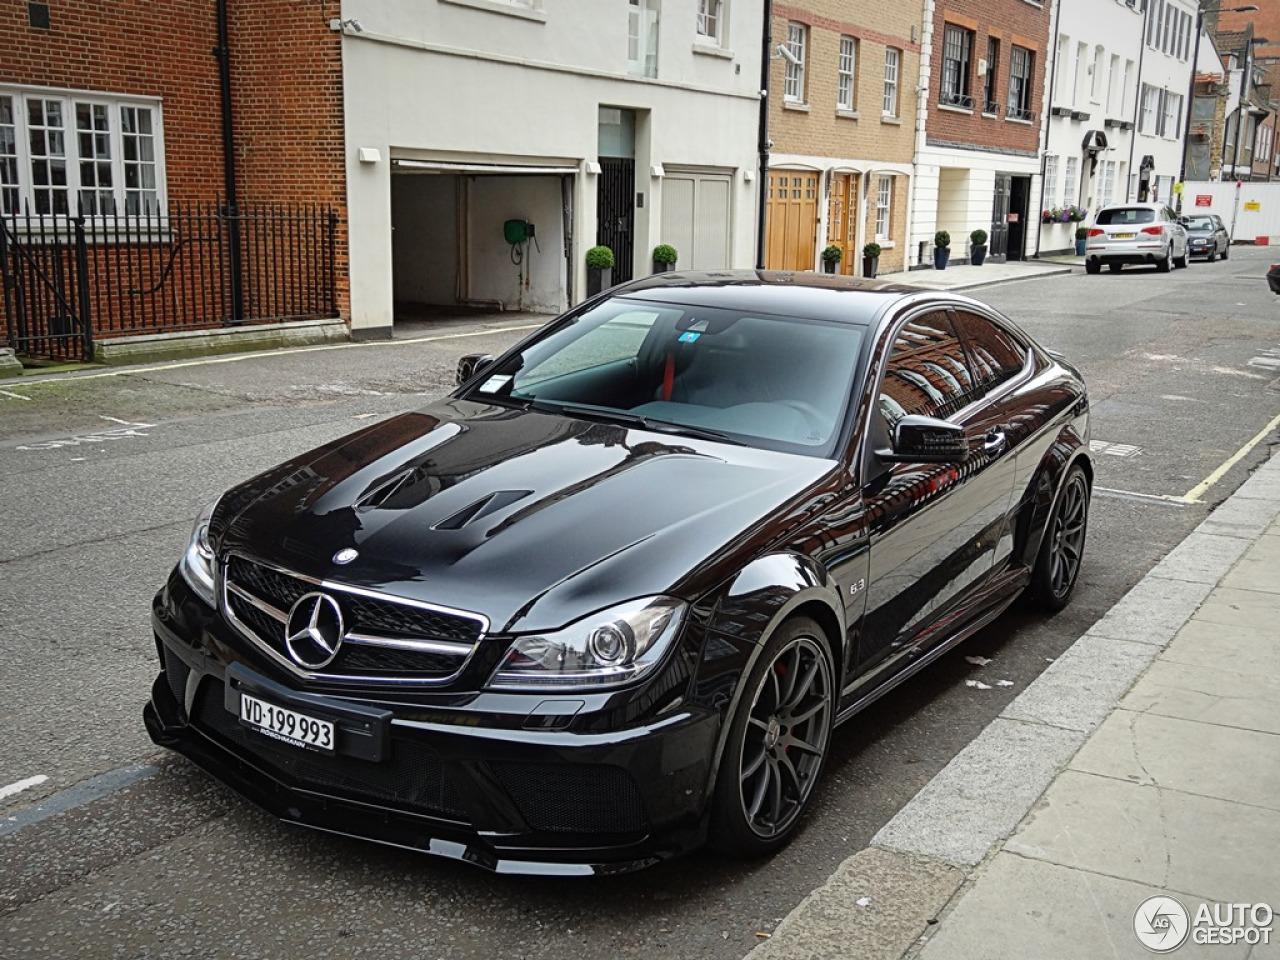 Mercedes 6X6 For Sale >> Mercedes-Benz C 63 AMG Coupé Black Series - 21 September ...